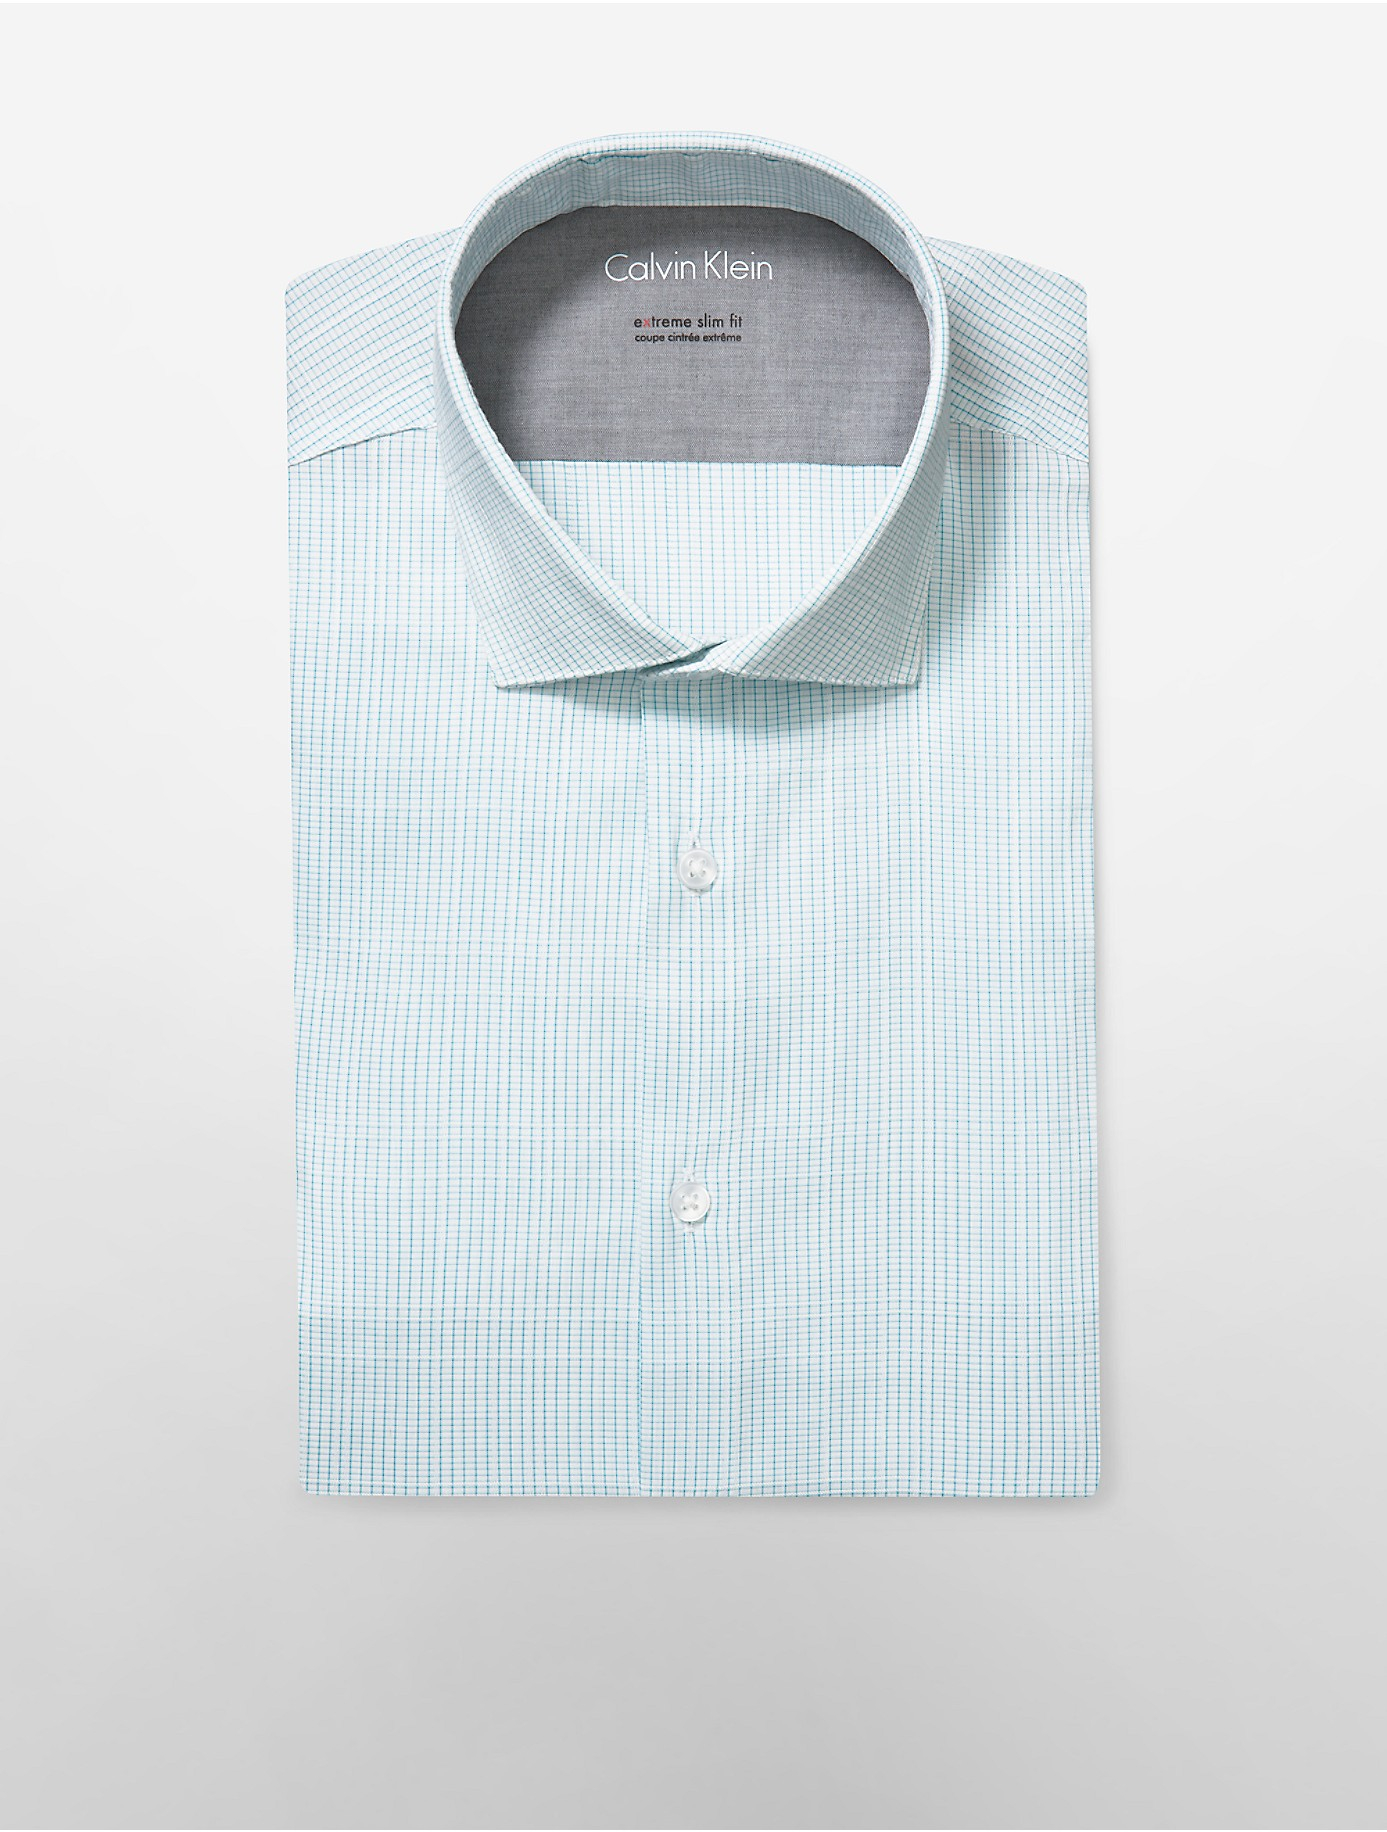 Lyst calvin klein white label x fit ultra slim fit mini for Calvin klein x fit dress shirt